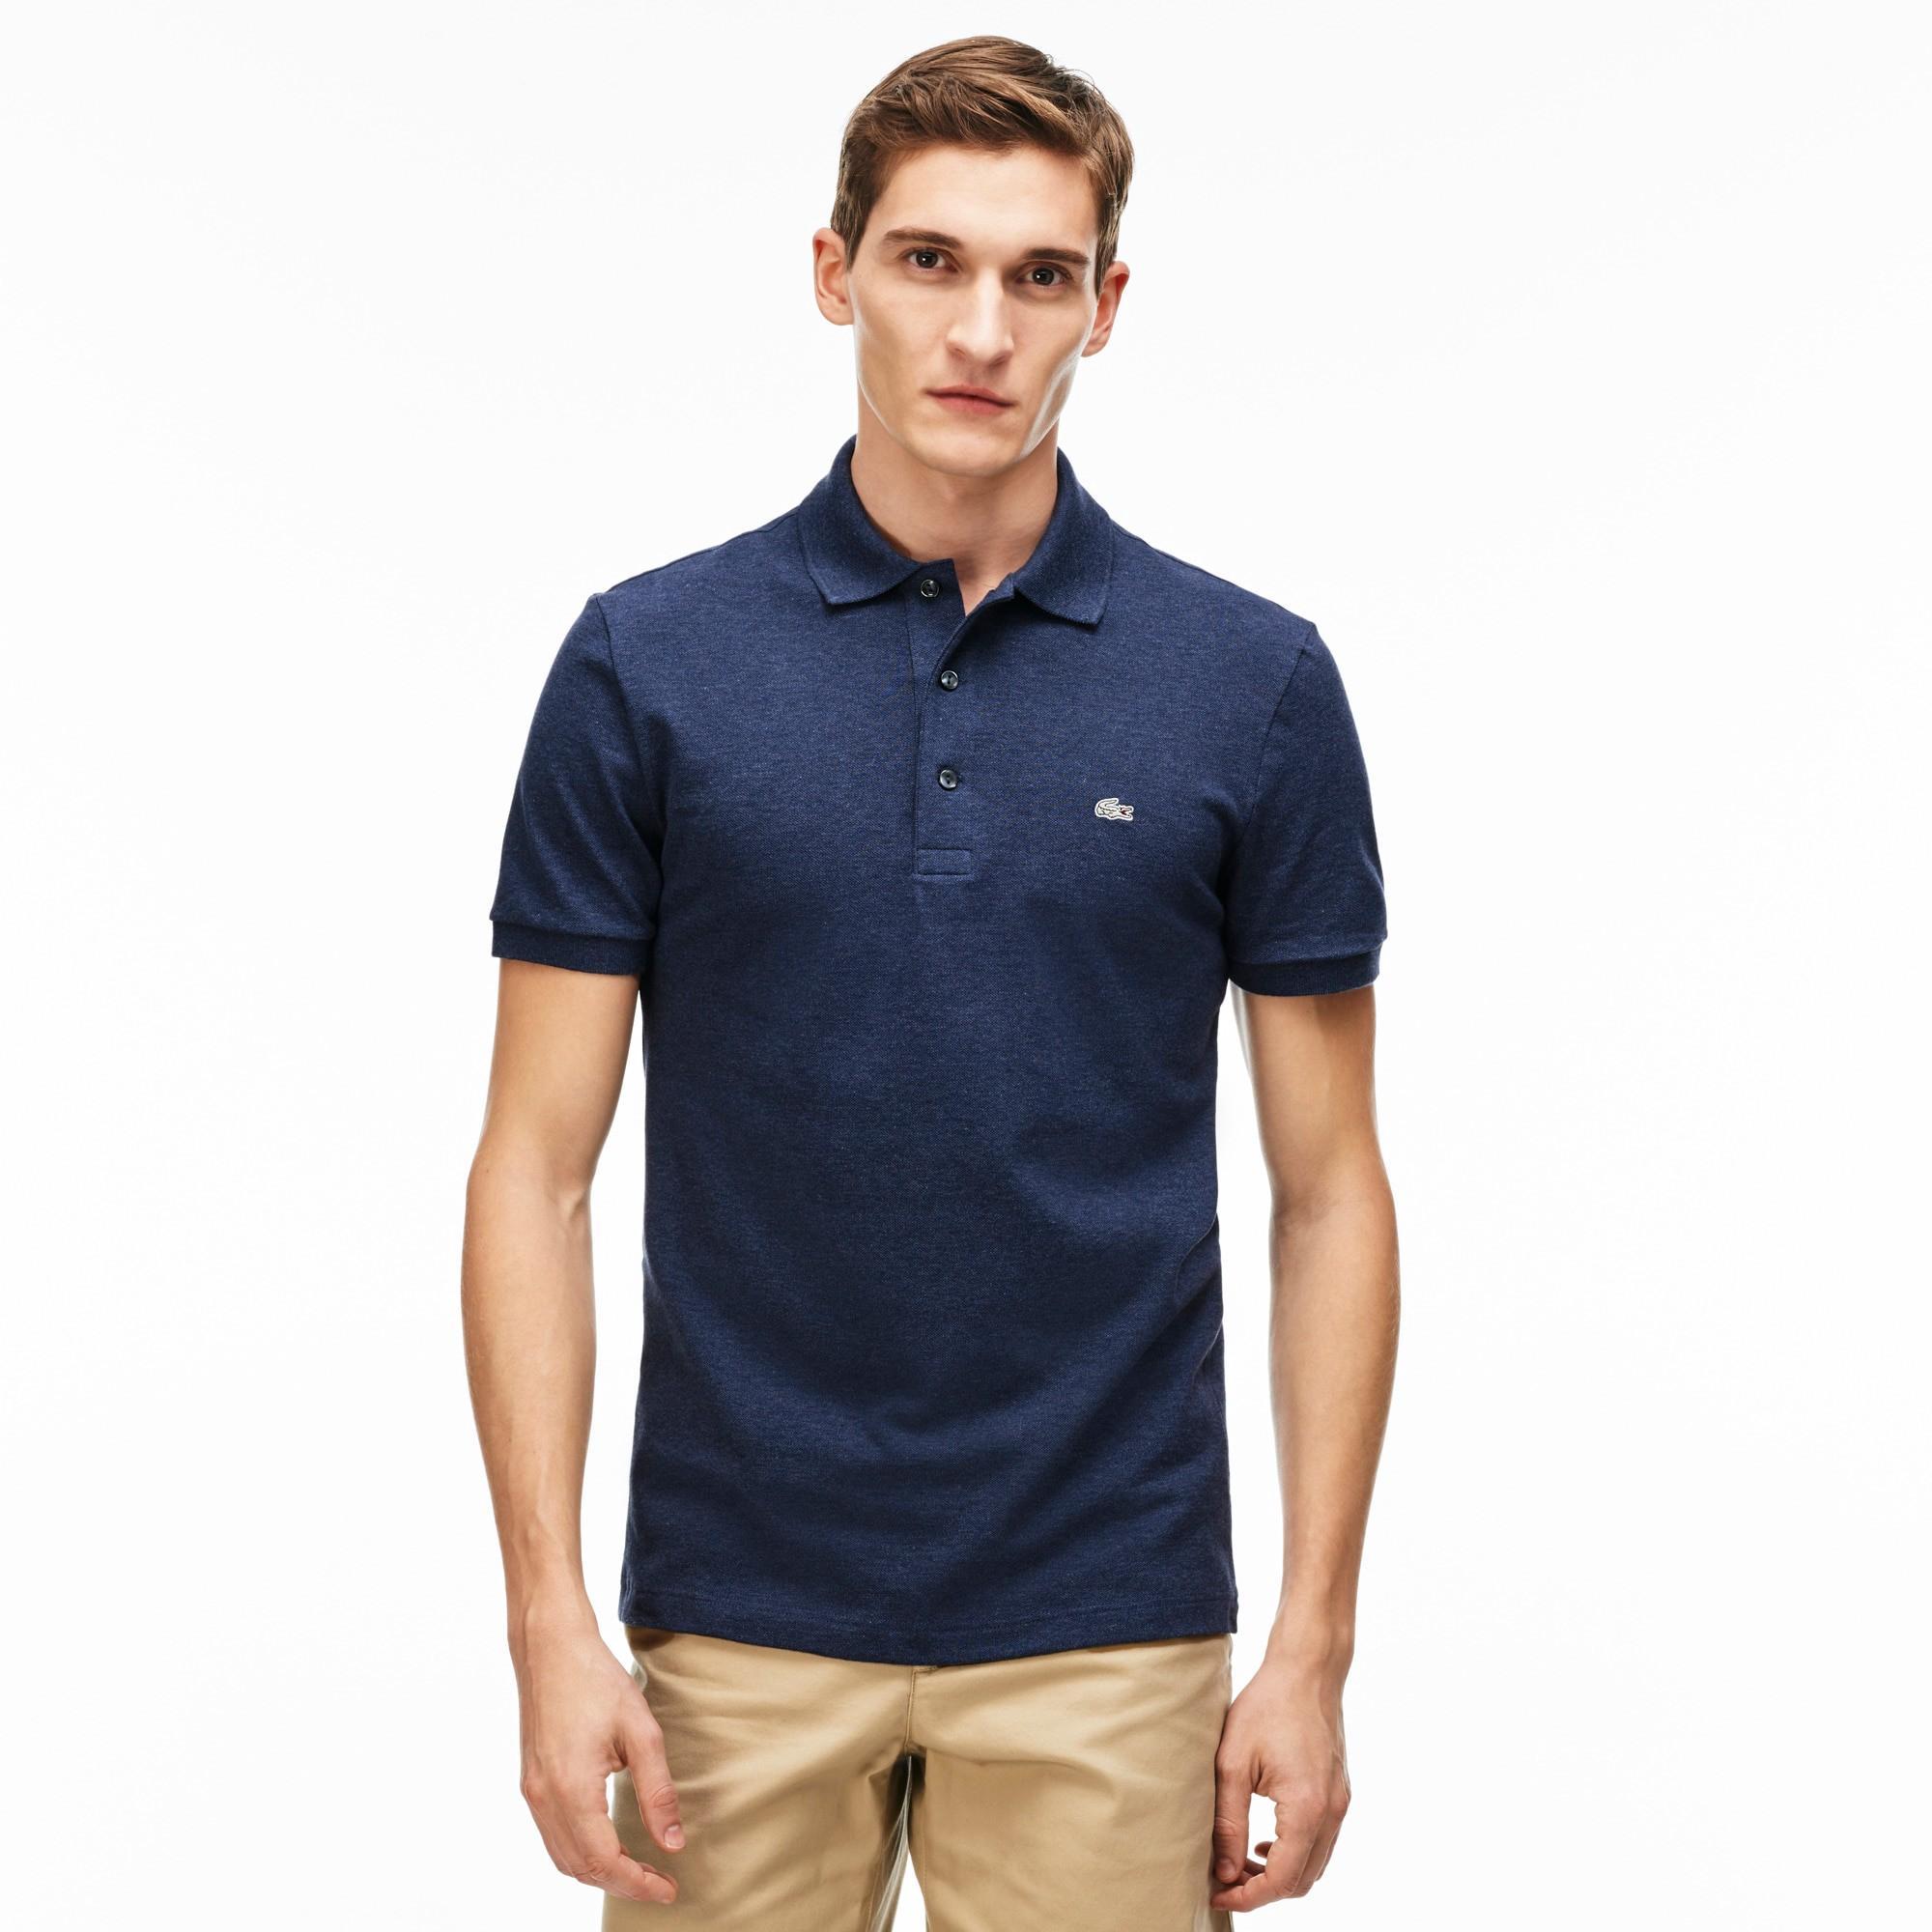 Men's Slim Fit Stretch Piqué Polo Shirt - Philippines Blue Chine